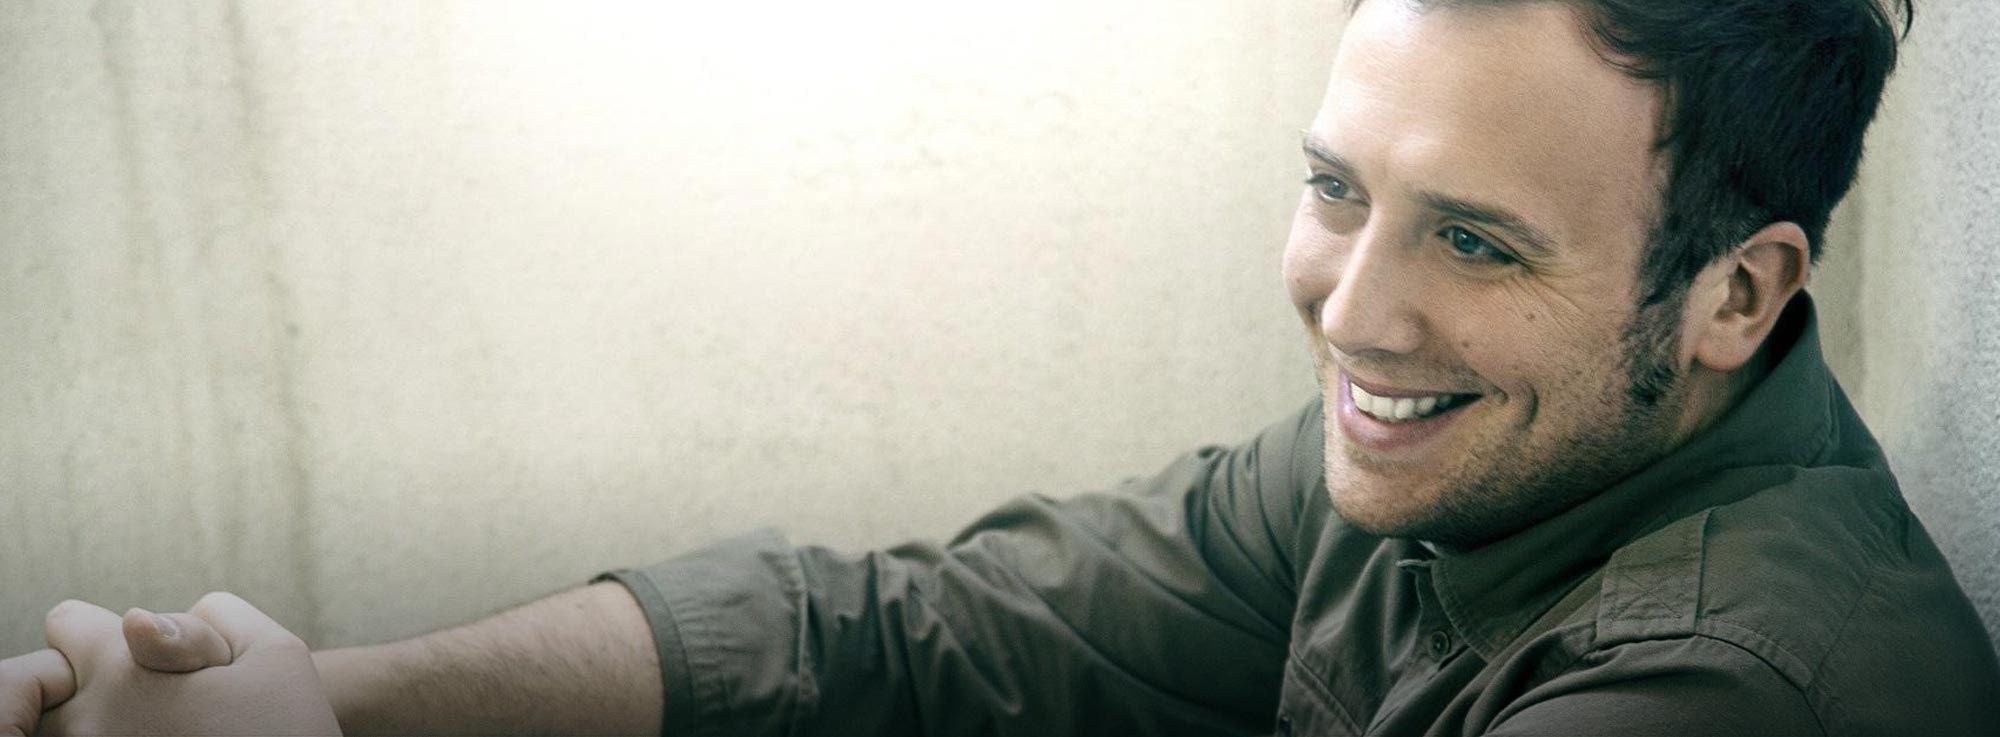 Trani: Raphael Gualazzi Love Life Peace Tour